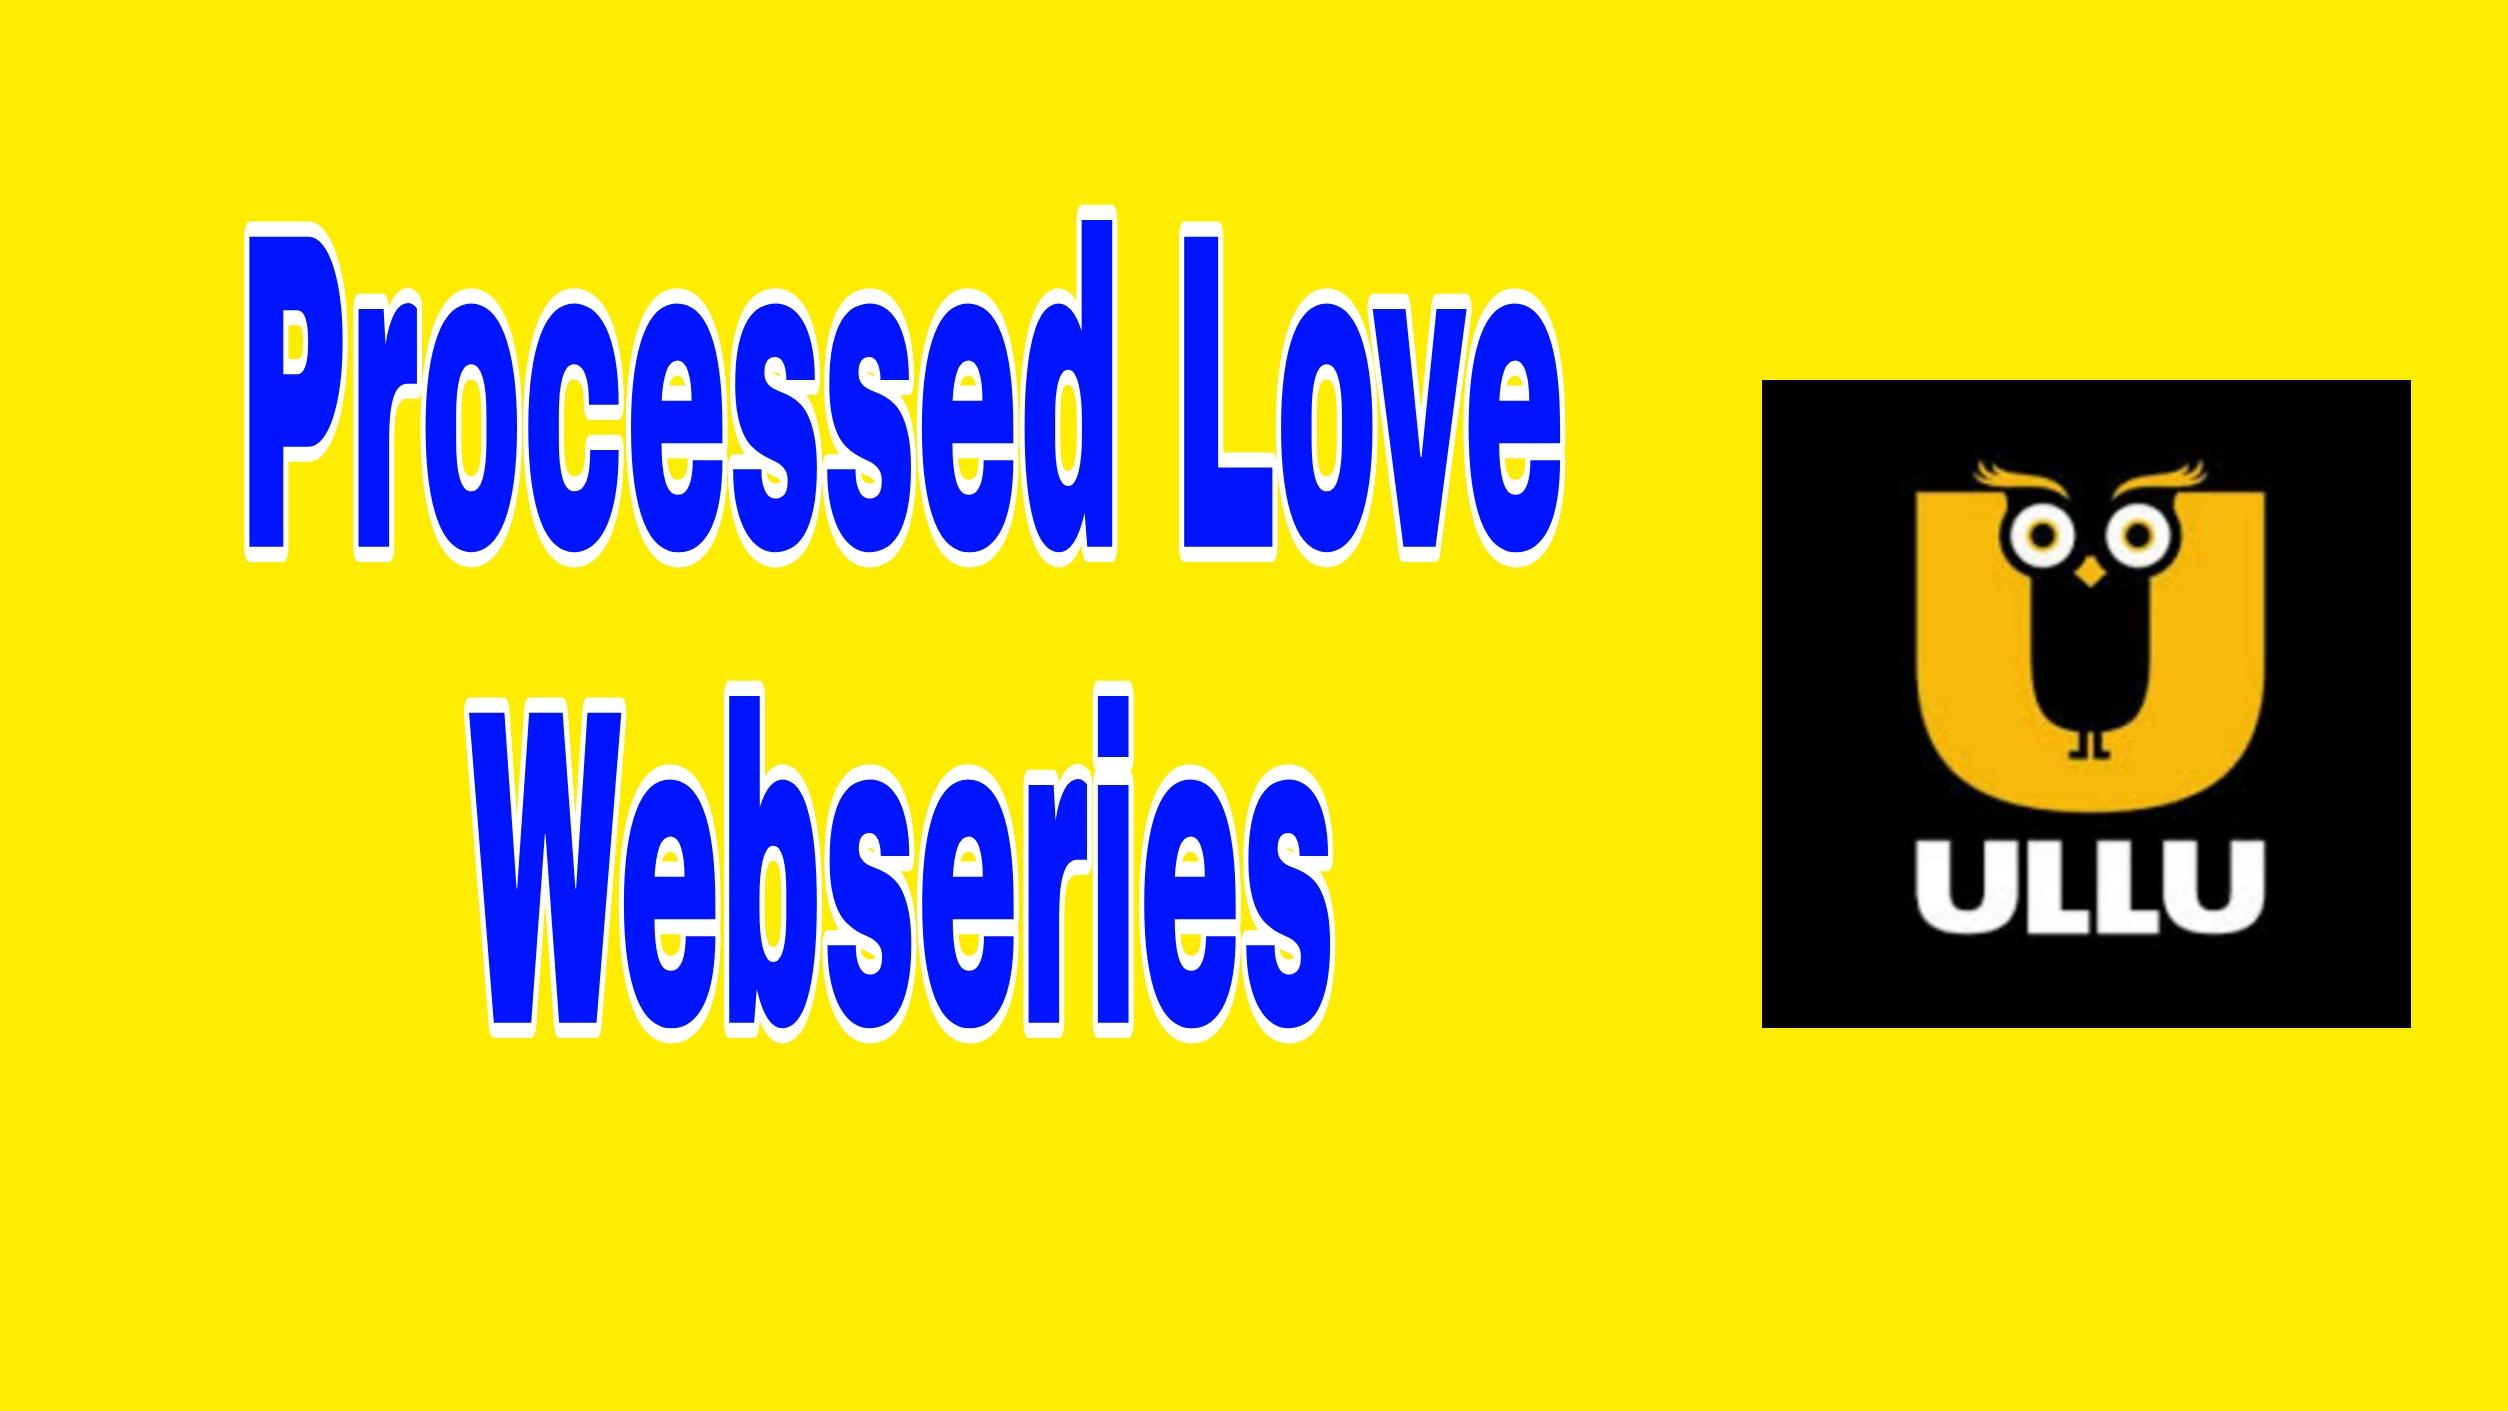 Processed Love